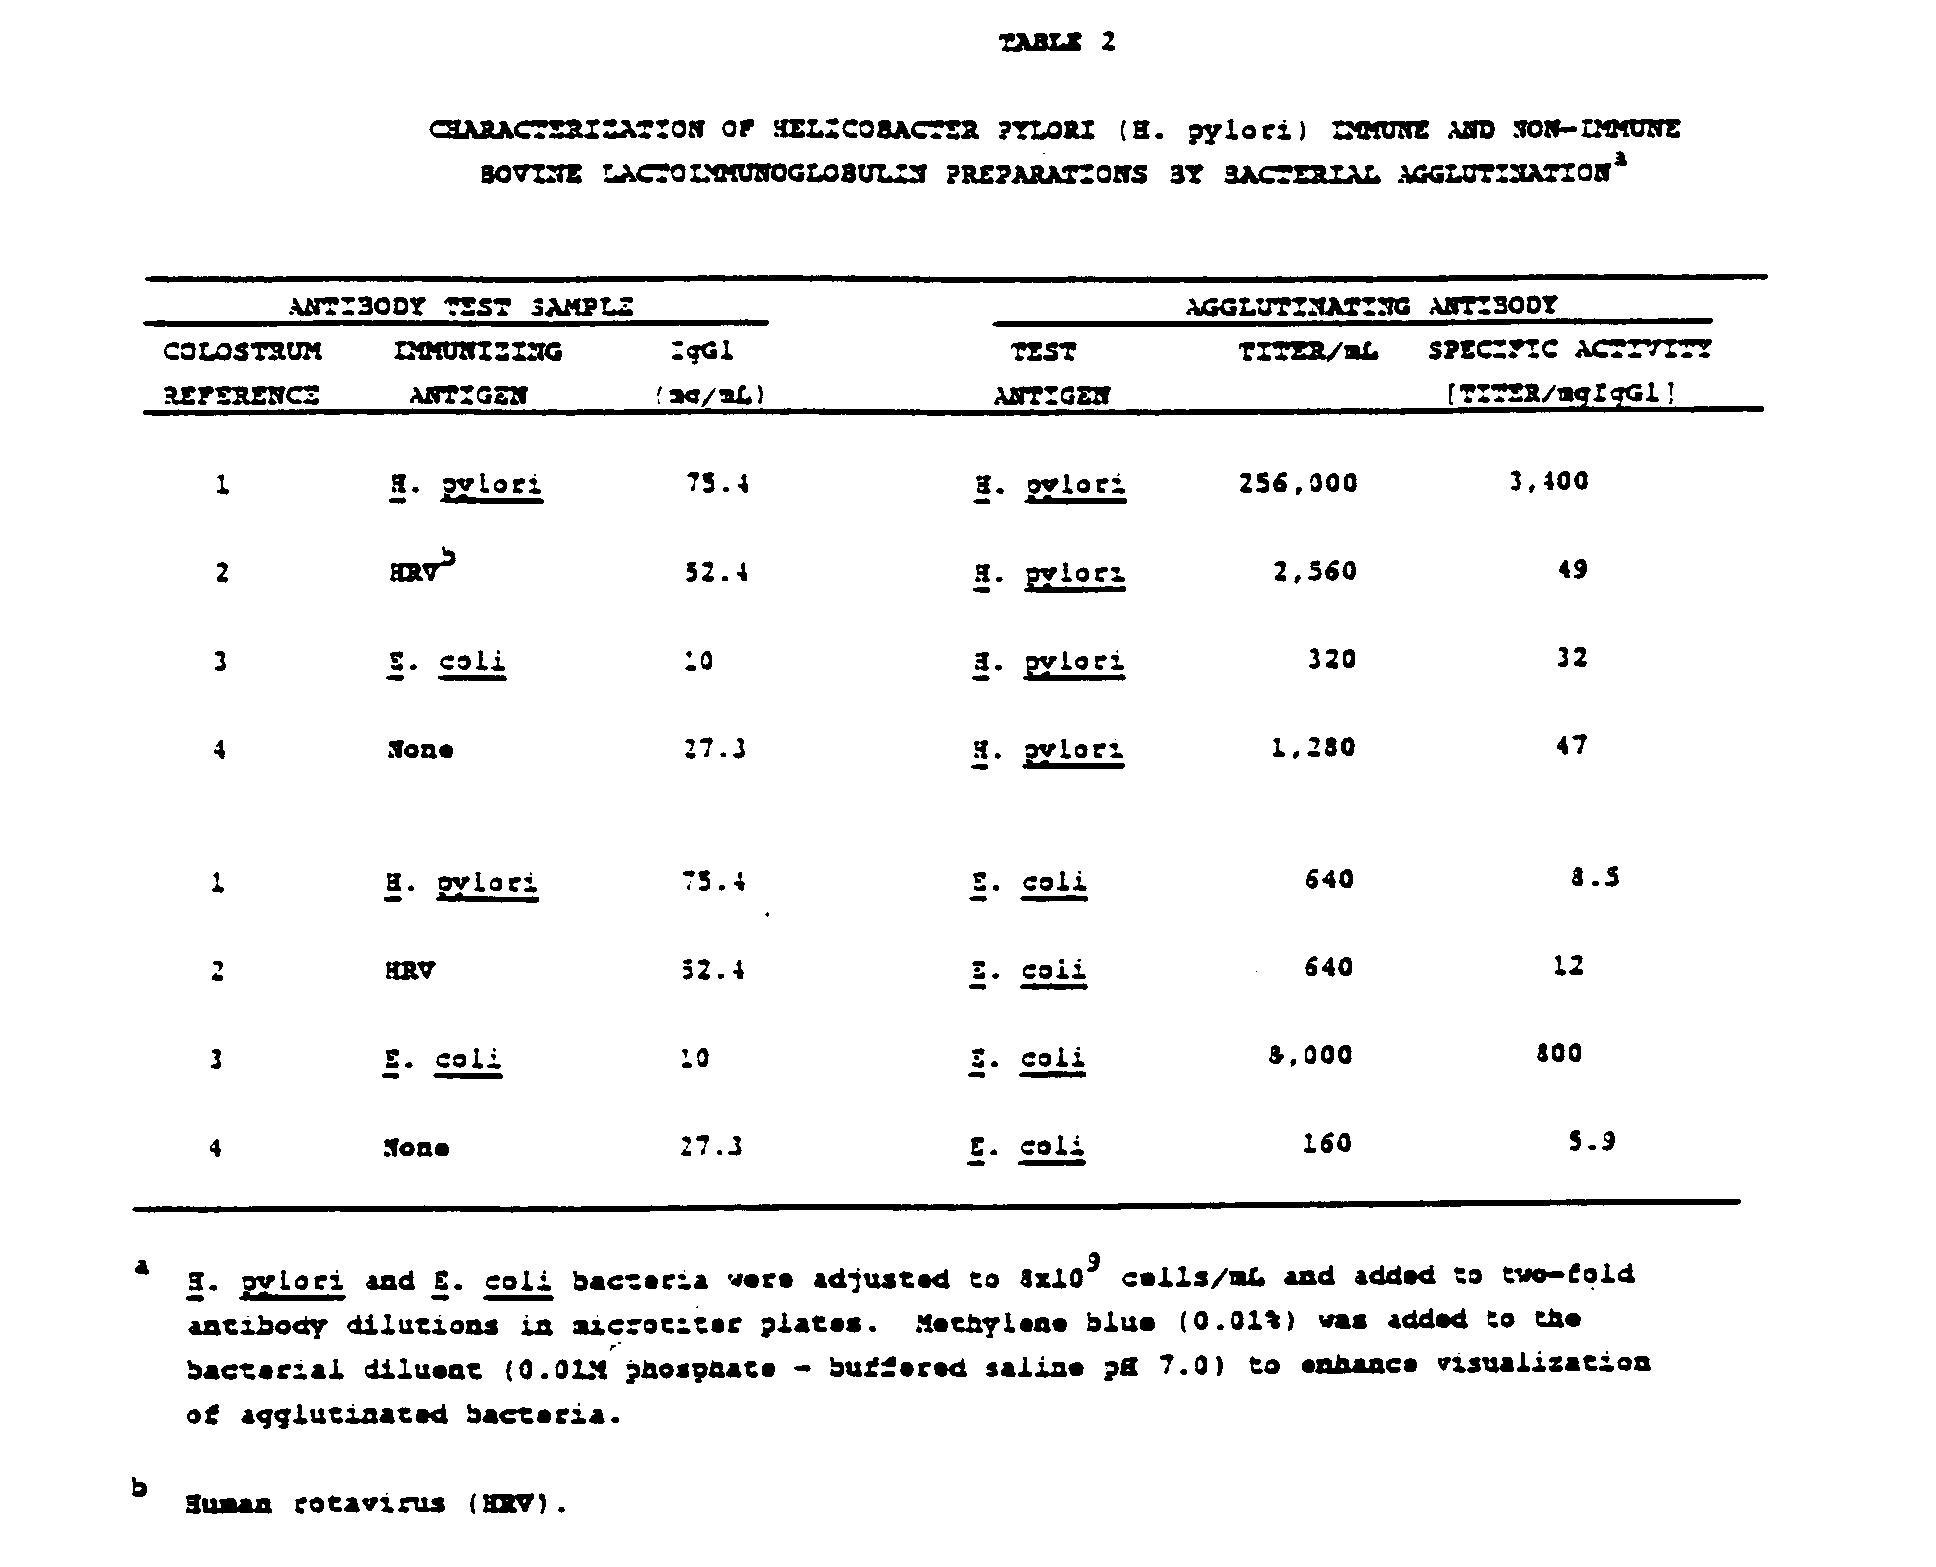 immunoglobulin chart